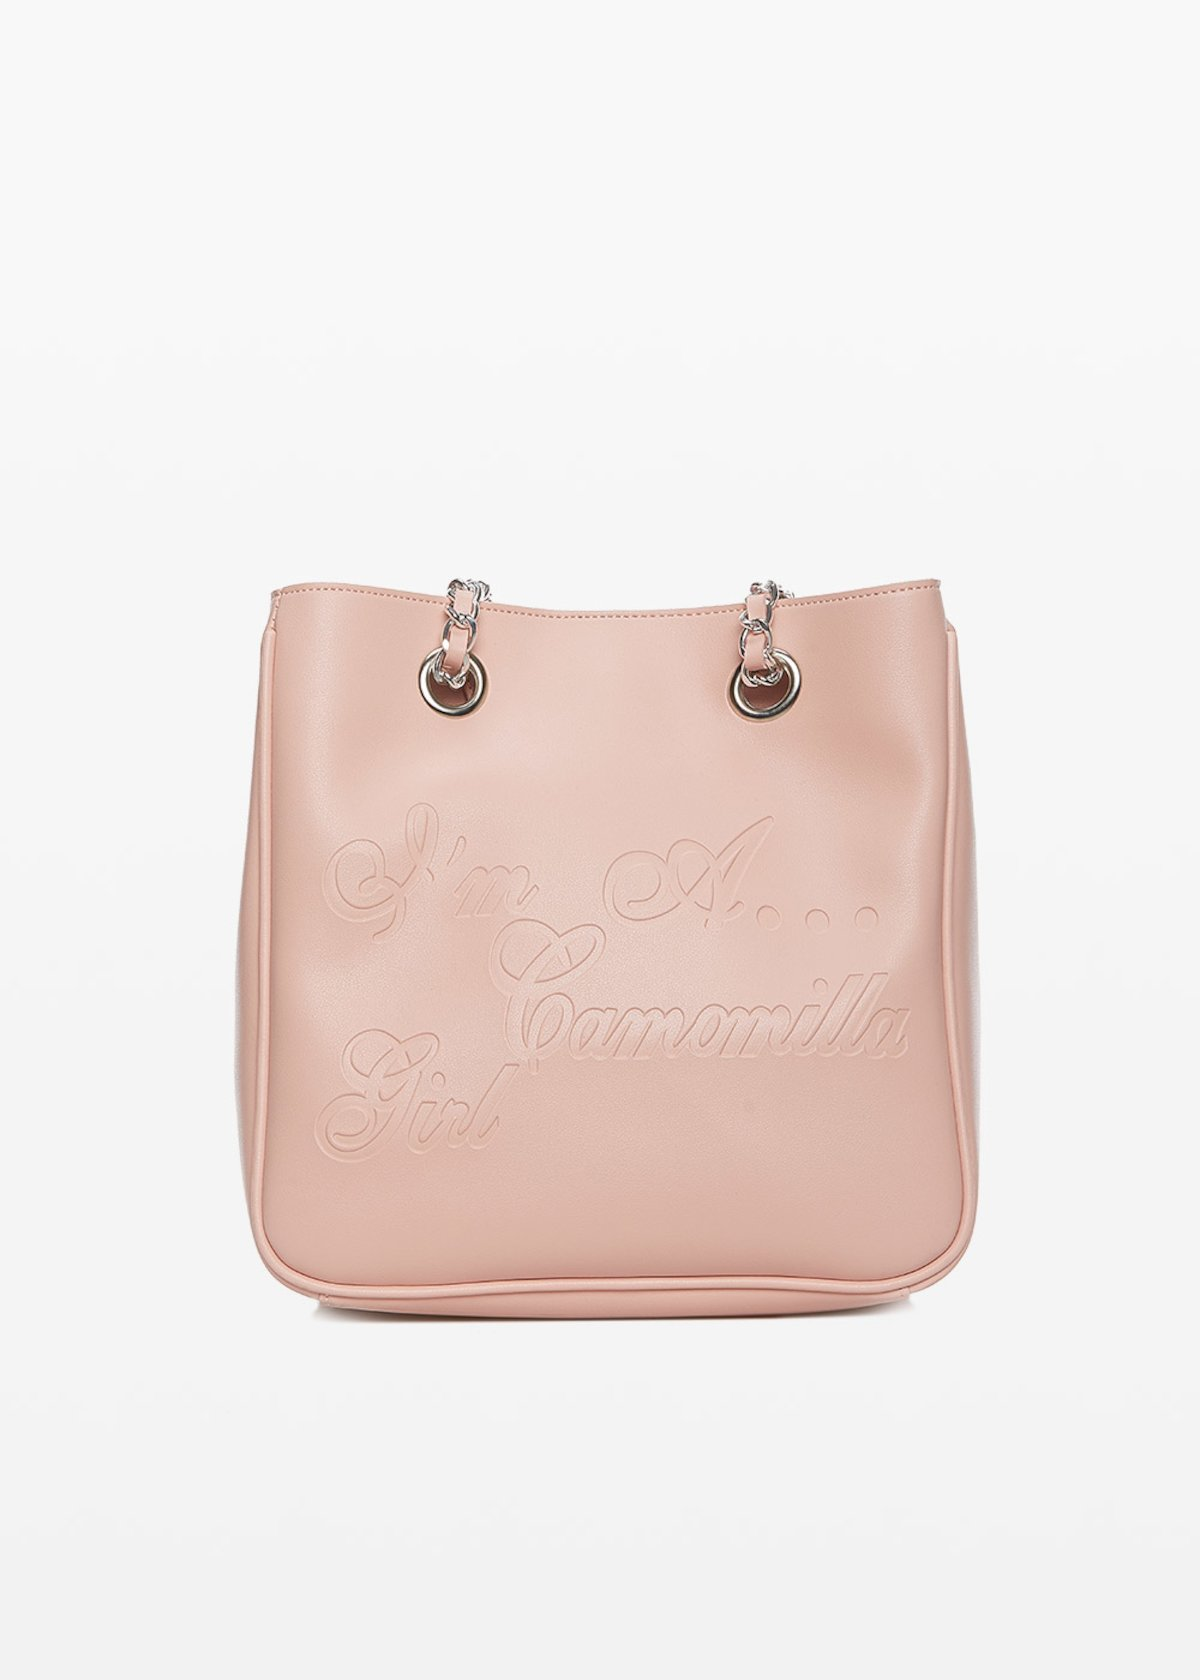 Shopping bag Micamunli in ecopelle con logo